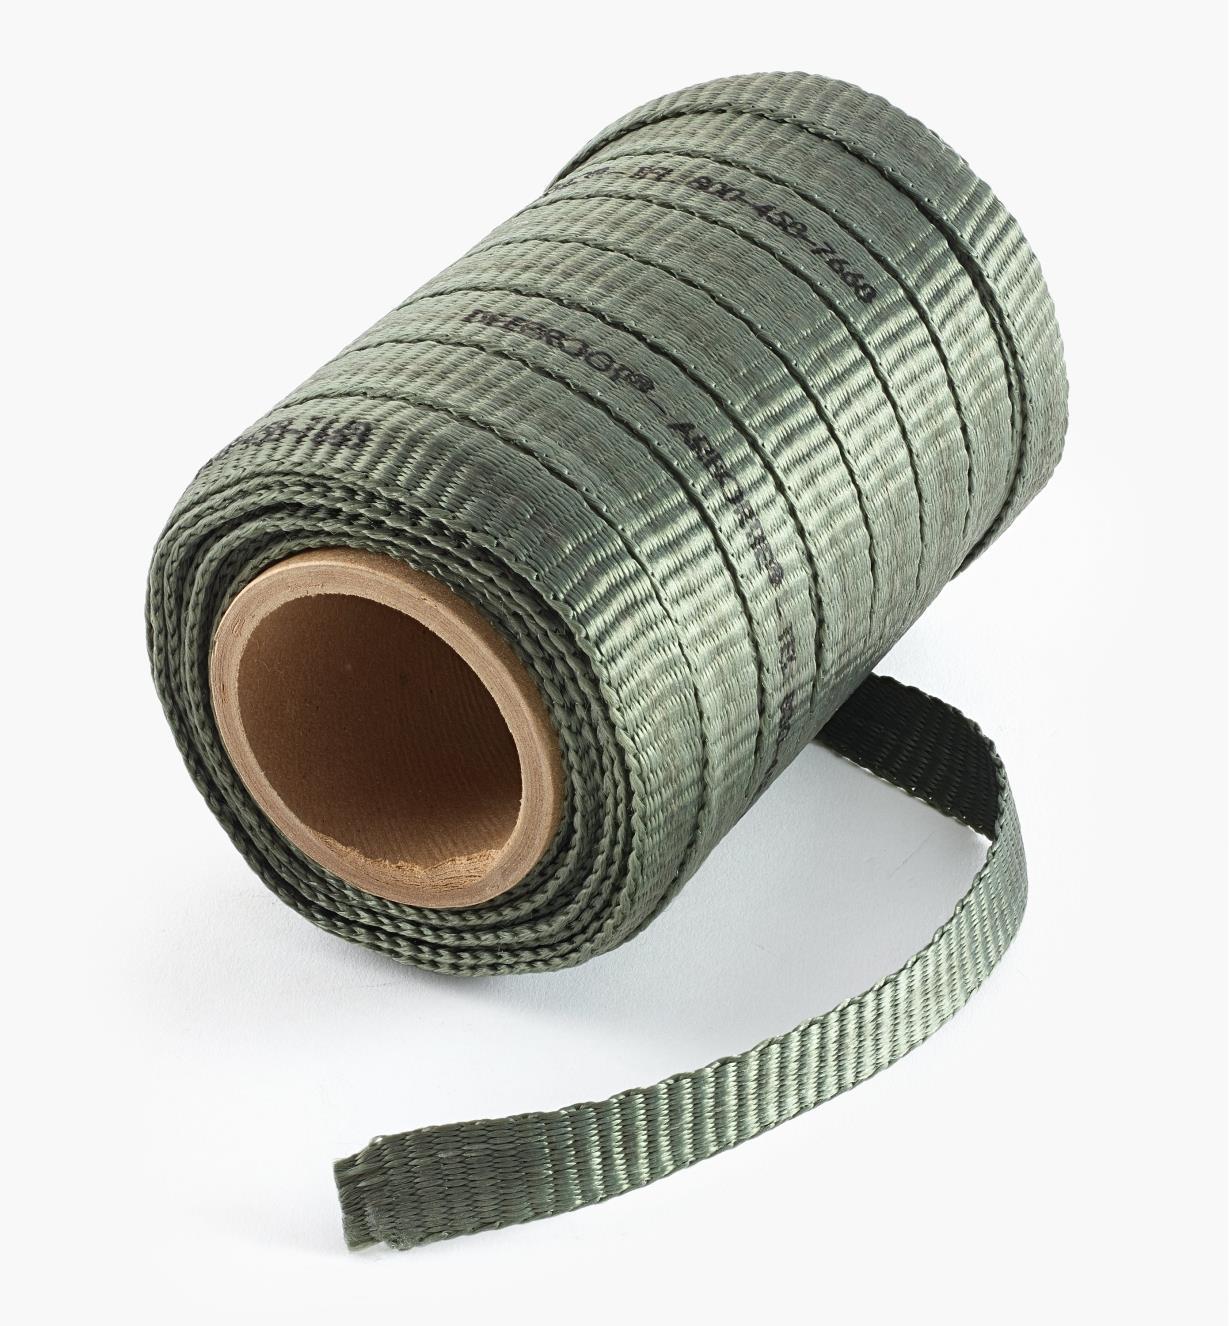 EA137 - Arbor Tape, 100' roll